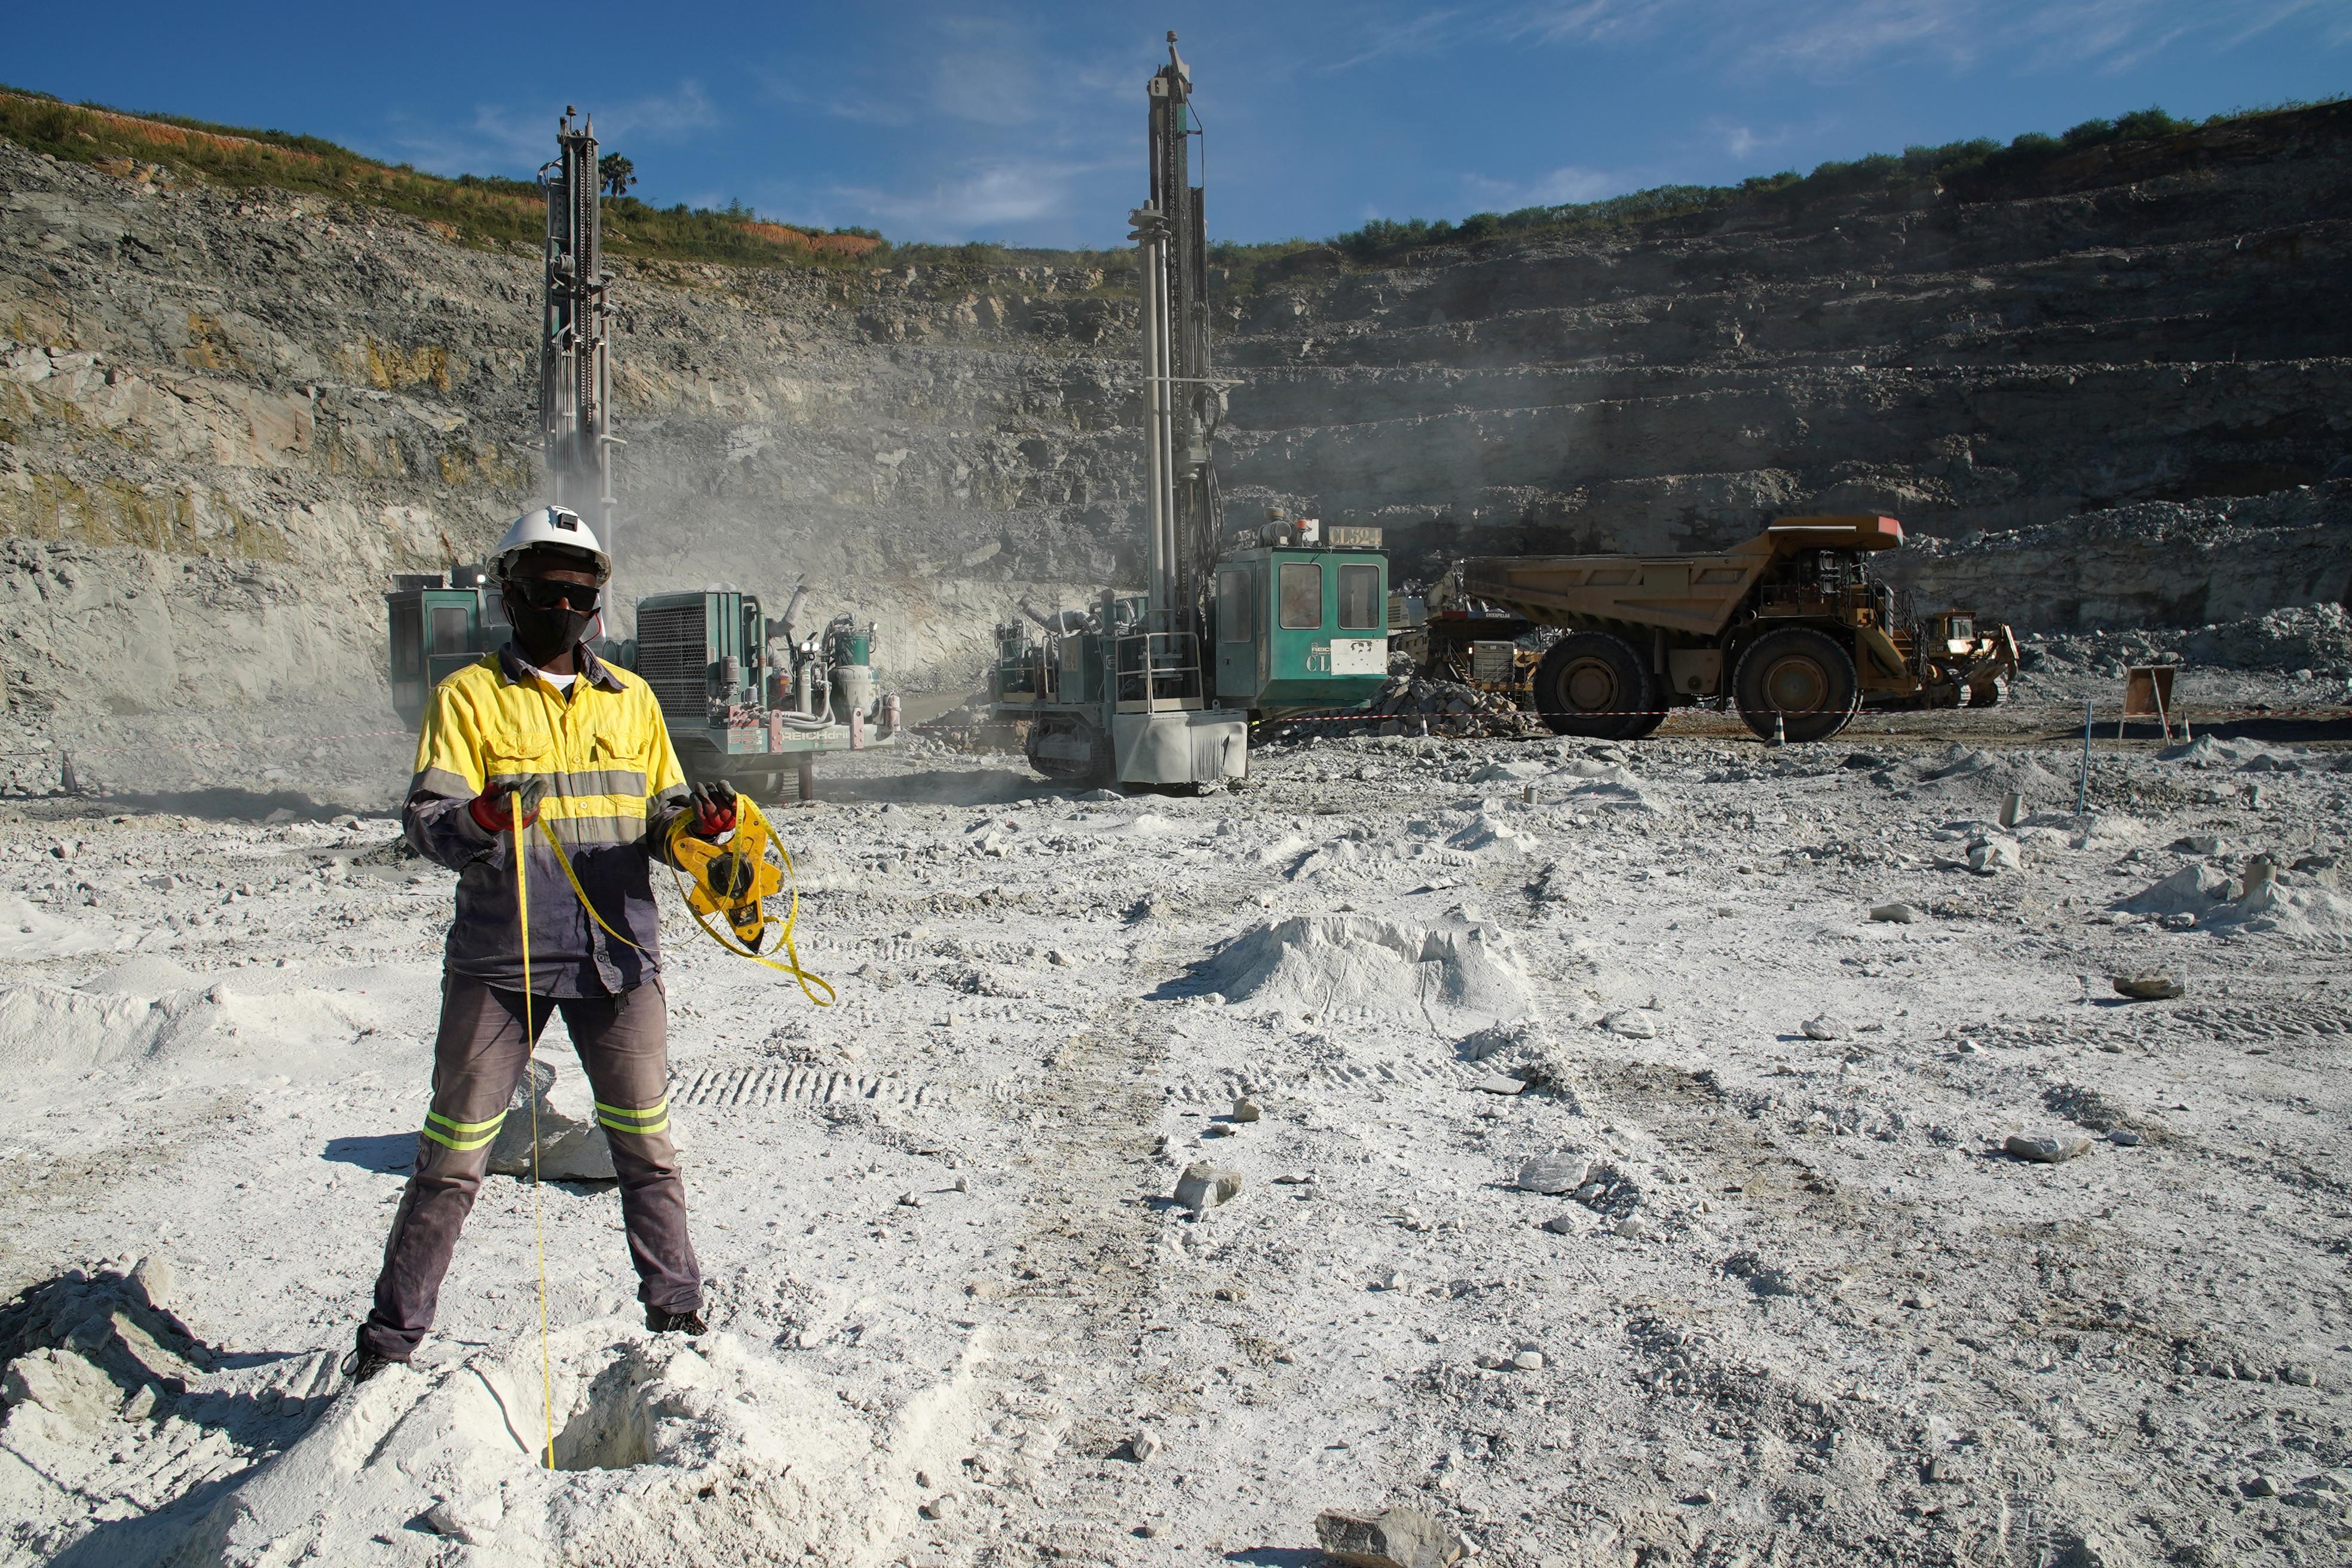 A miner measures the depth of blast holes at the Kibali gold mine Haut-Uele province, Democratic Republic of Congo October 8, 2021 . REUTERS/Hereward Holland